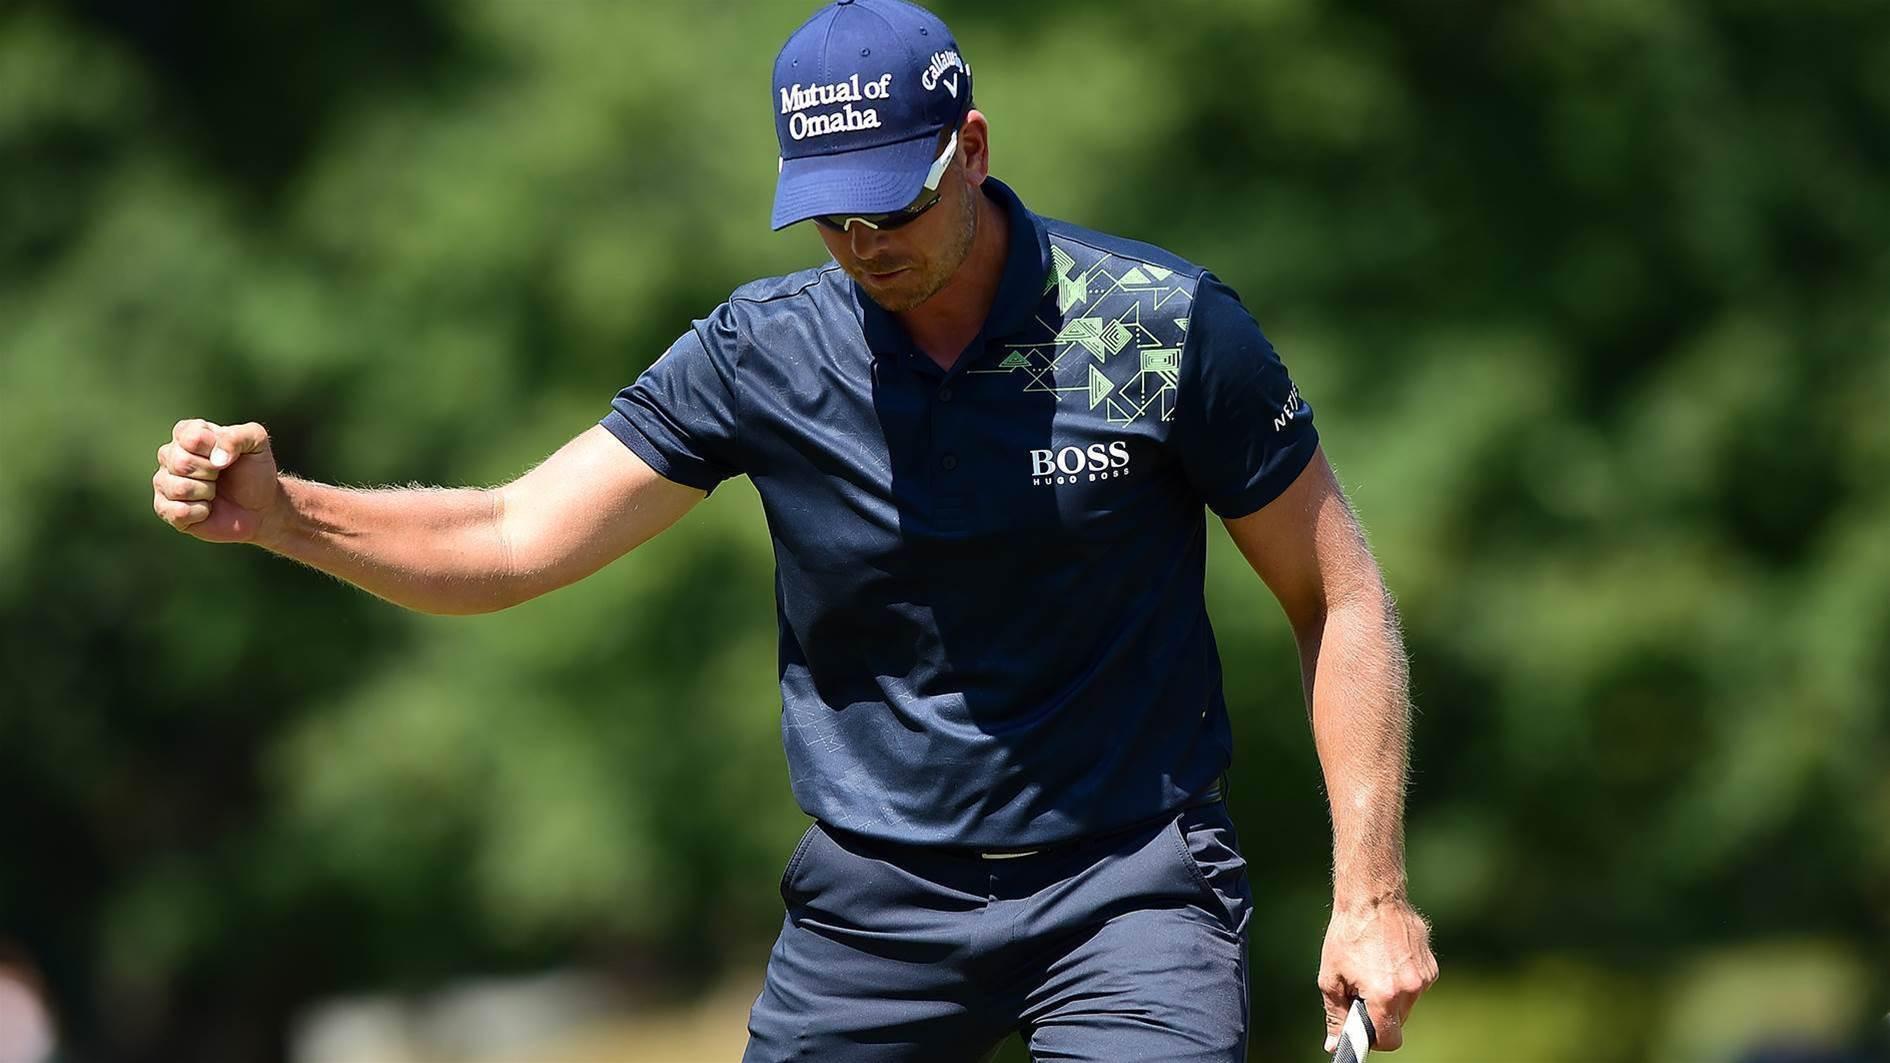 PGA TOUR: Stenson ices victory at Wyndham